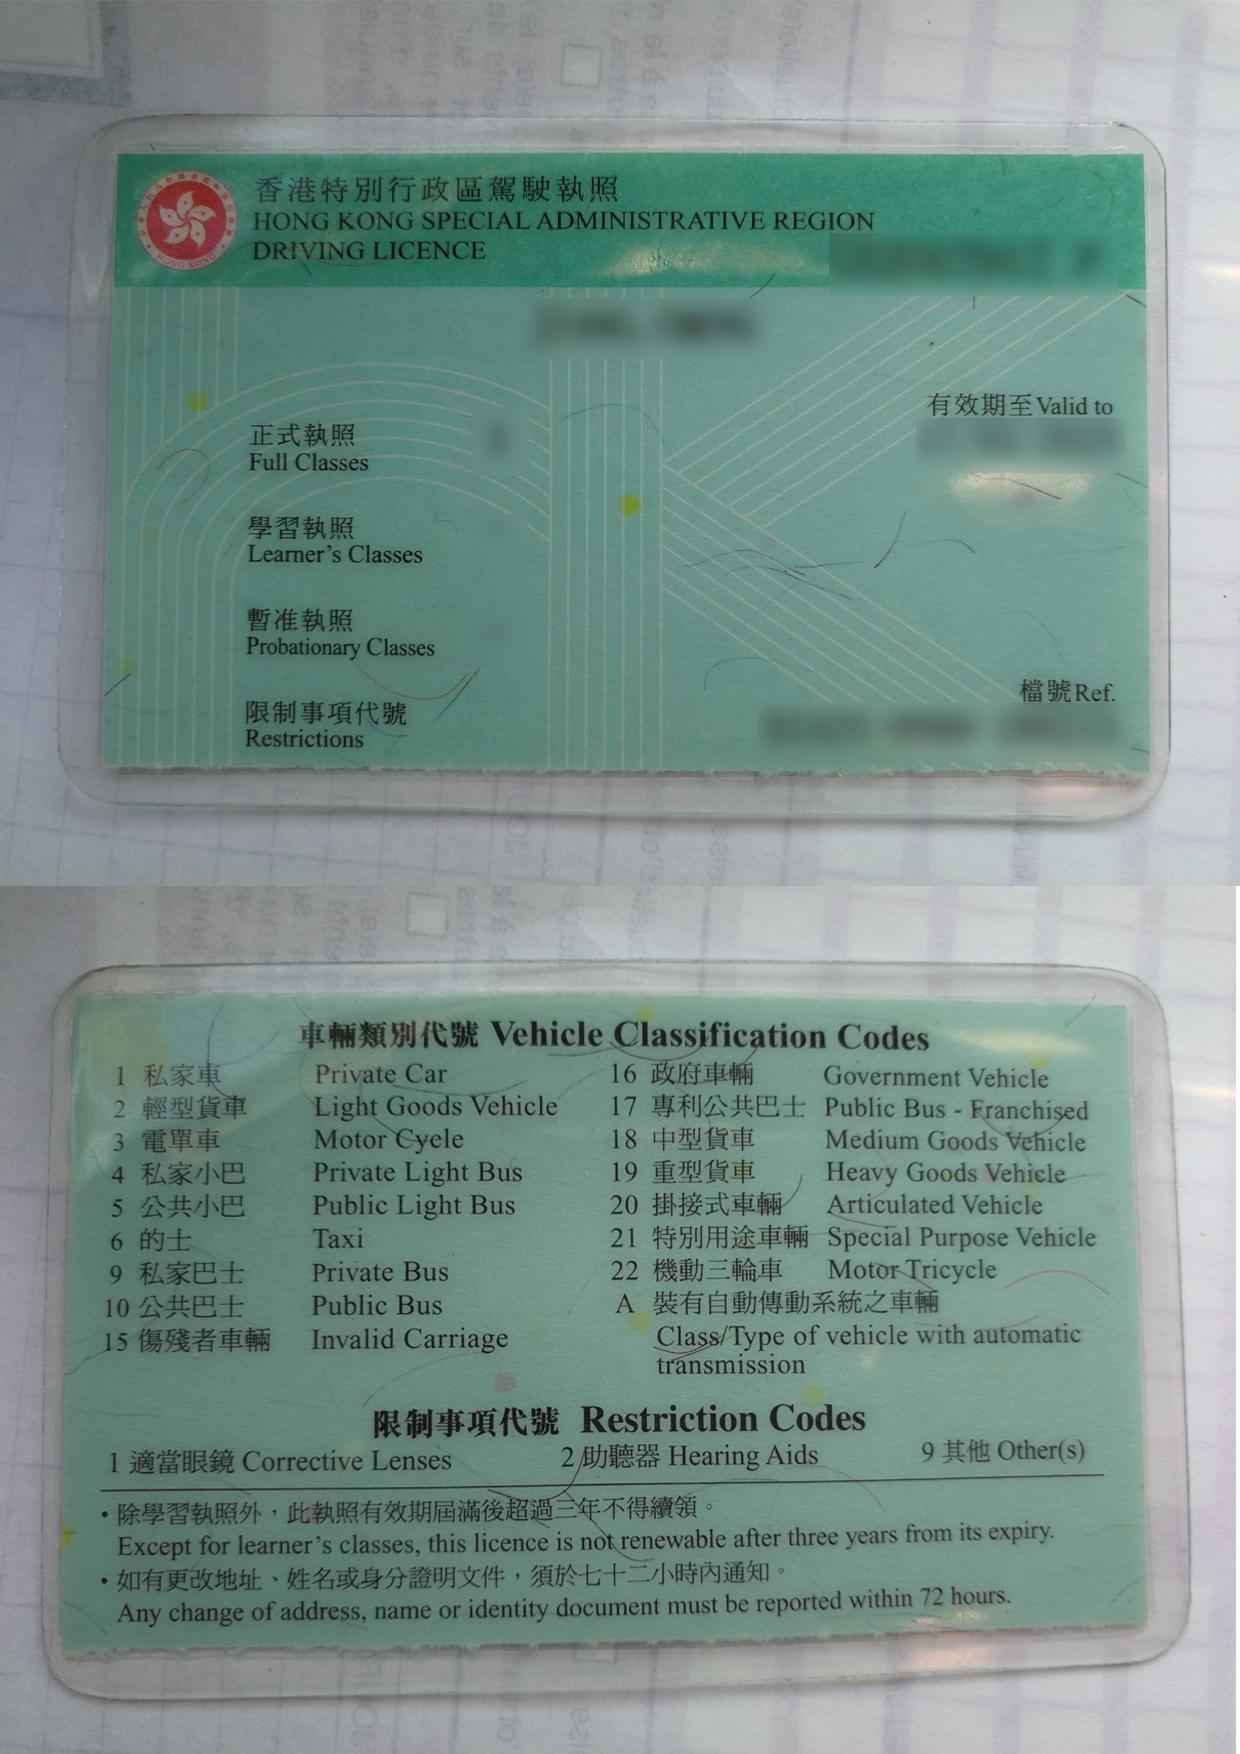 permis de conduire  u2013 traducteurs asserment u00e9s